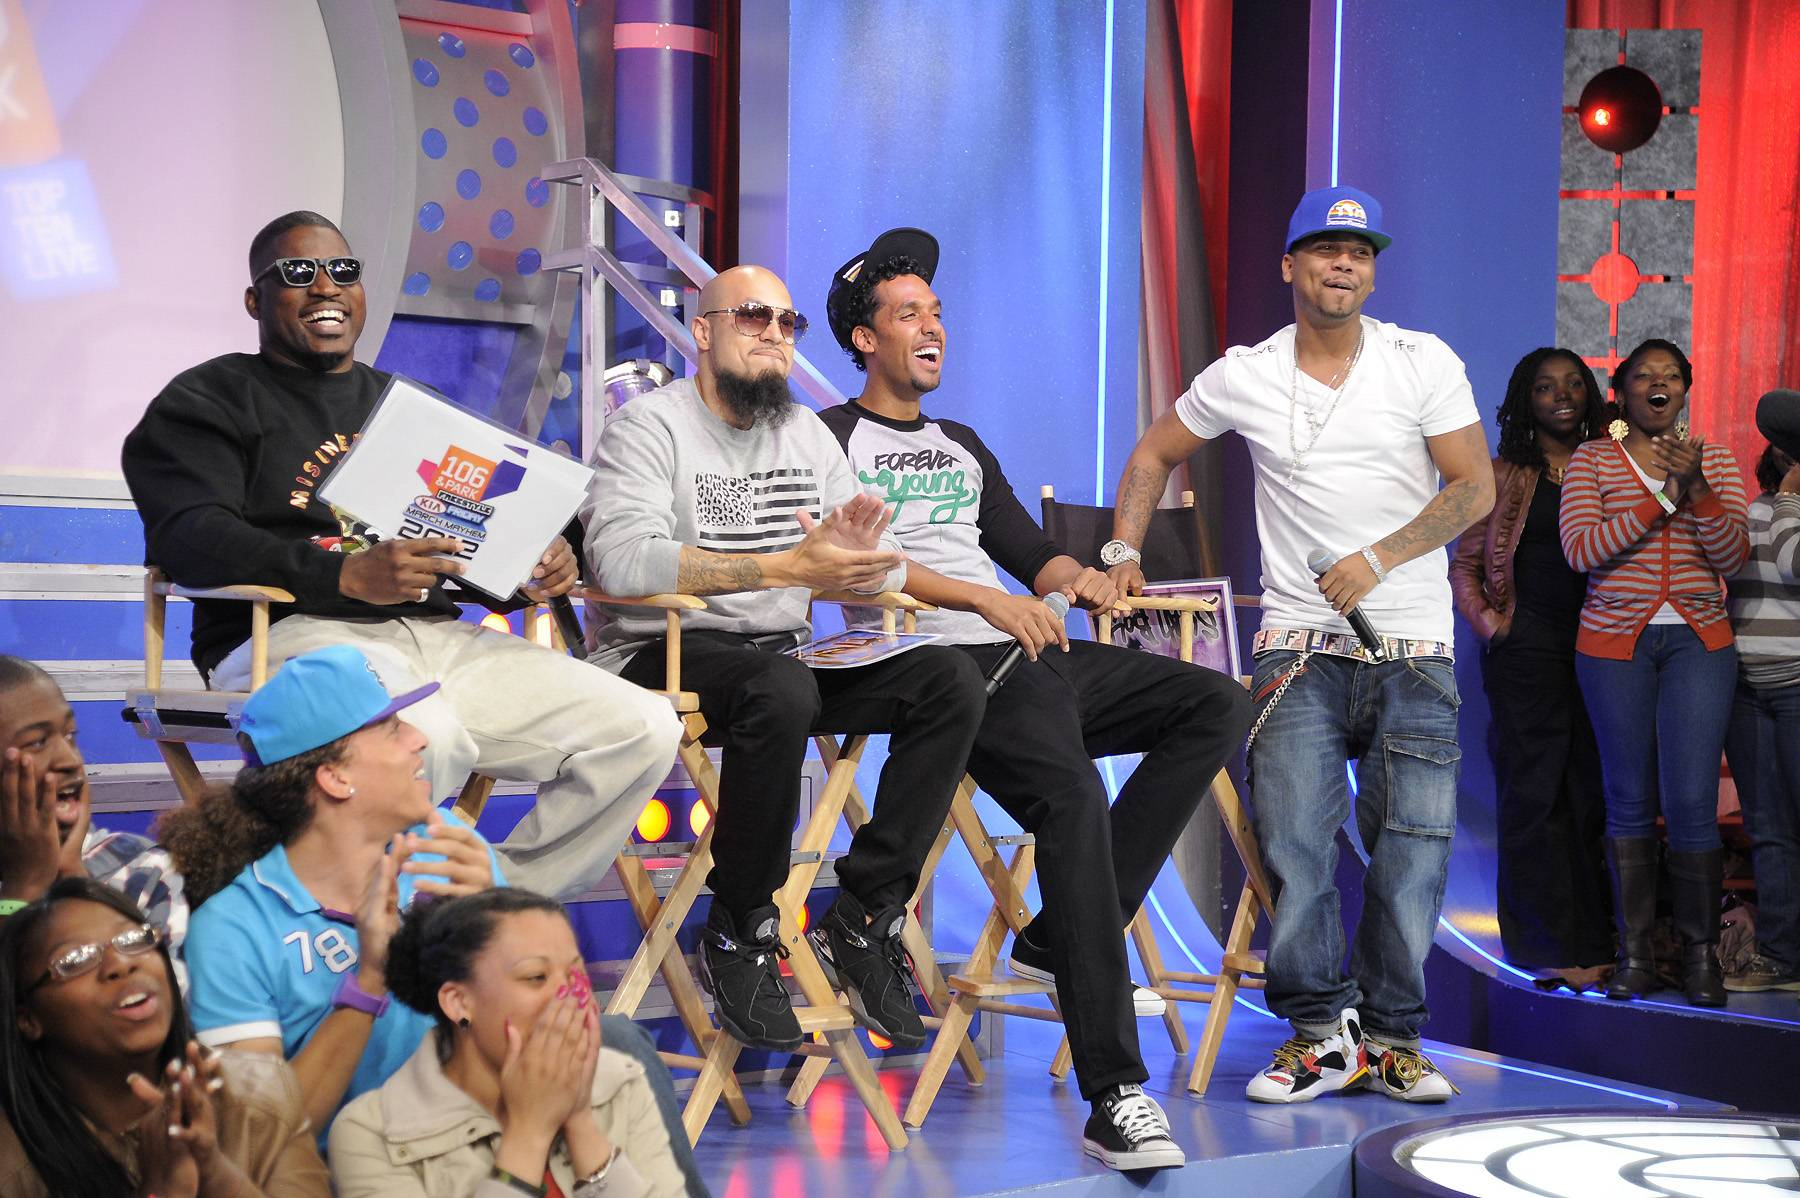 Getting Kinda Heated - Freestyle Friday judges David Banner, Cool and Dre and Juelz Santana at 106 & Park, April 6, 2012. (photo: John Ricard / BET)